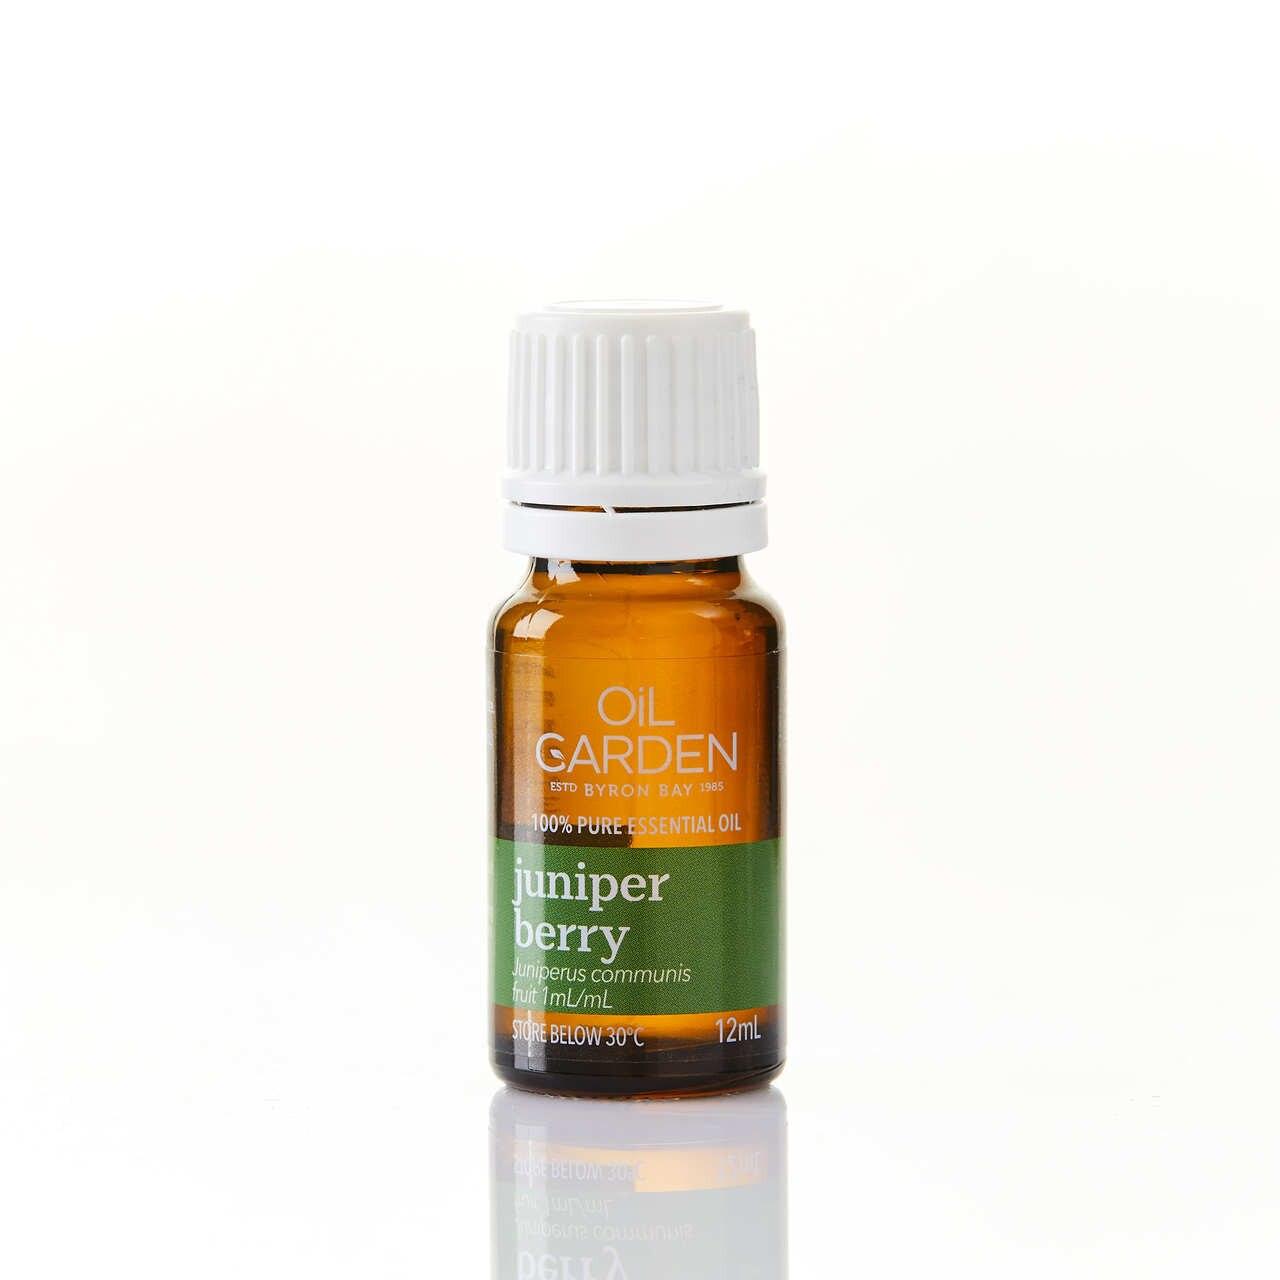 Oil Garden Juniper Berry Pure Essential Oil 12mL 6620042